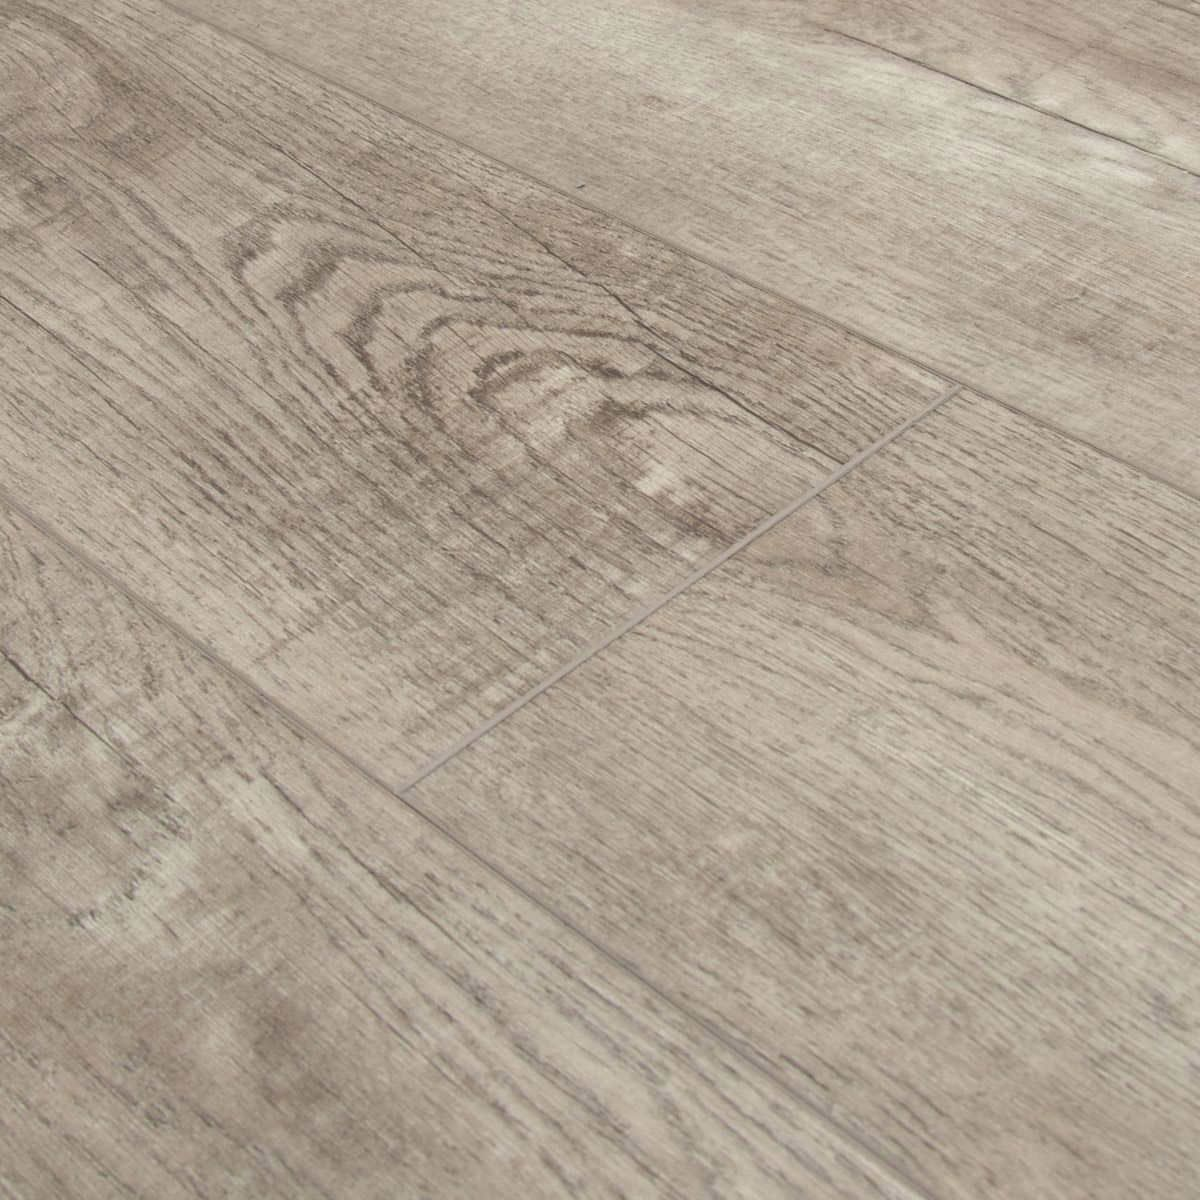 Mohawk Home Osprey Oak Waterproof Rigid 5mm Thick Luxury Vinyl Plank Flooring 1mm Attached Pad Included In 2020 Waterproof Vinyl Plank Flooring Luxury Vinyl Plank Flooring Vinyl Plank Flooring